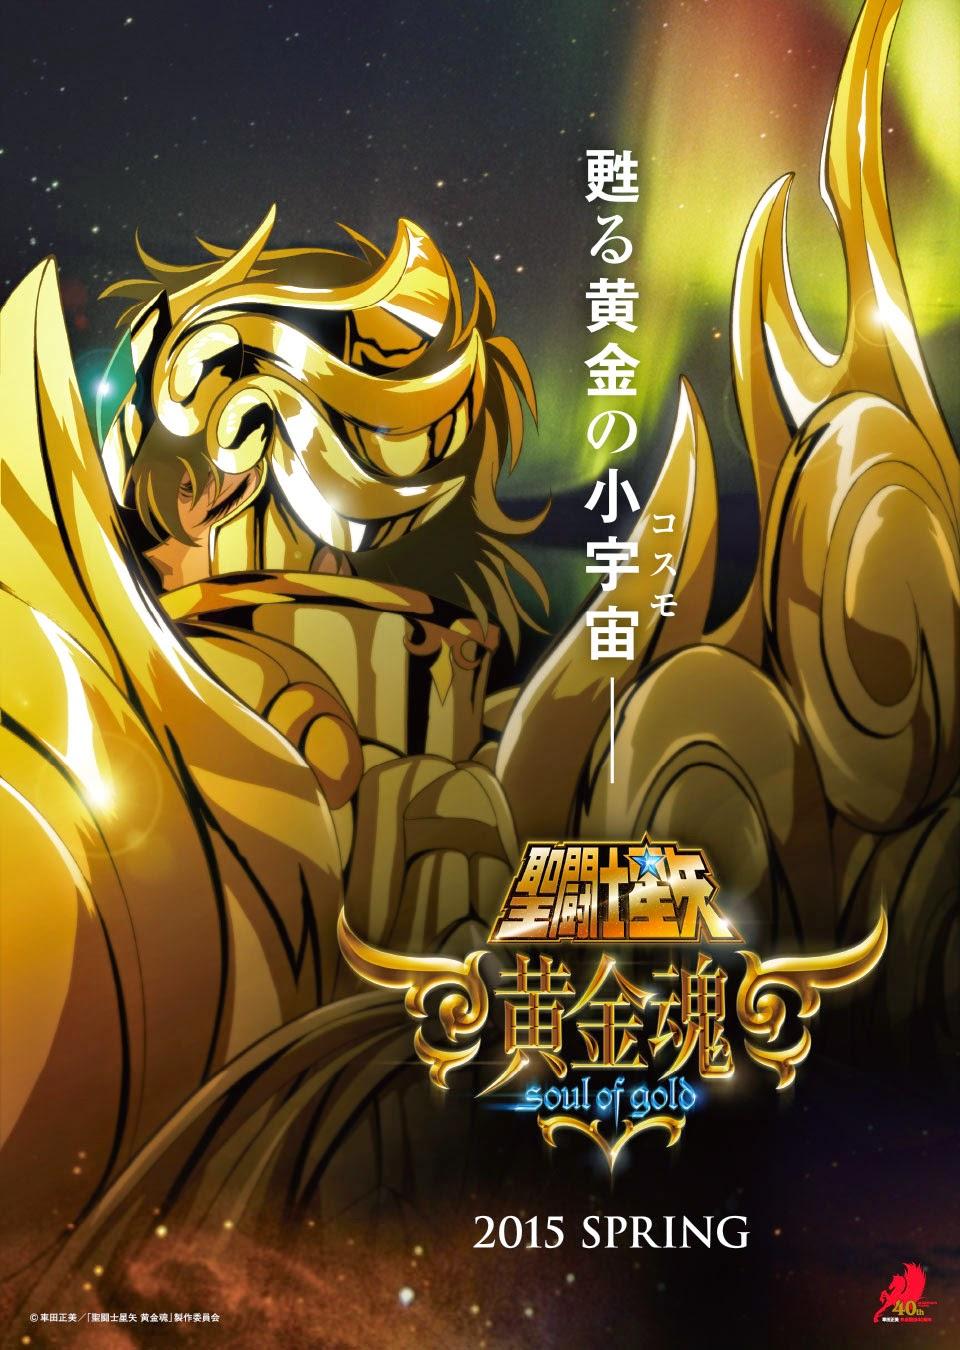 Saint Seiya : Soul of Gold, Toei Animation, Actu Japanime, Japanime, Takeshi Furuta, Toshimitsu Takeuchi, Hideyuki Motohashi,